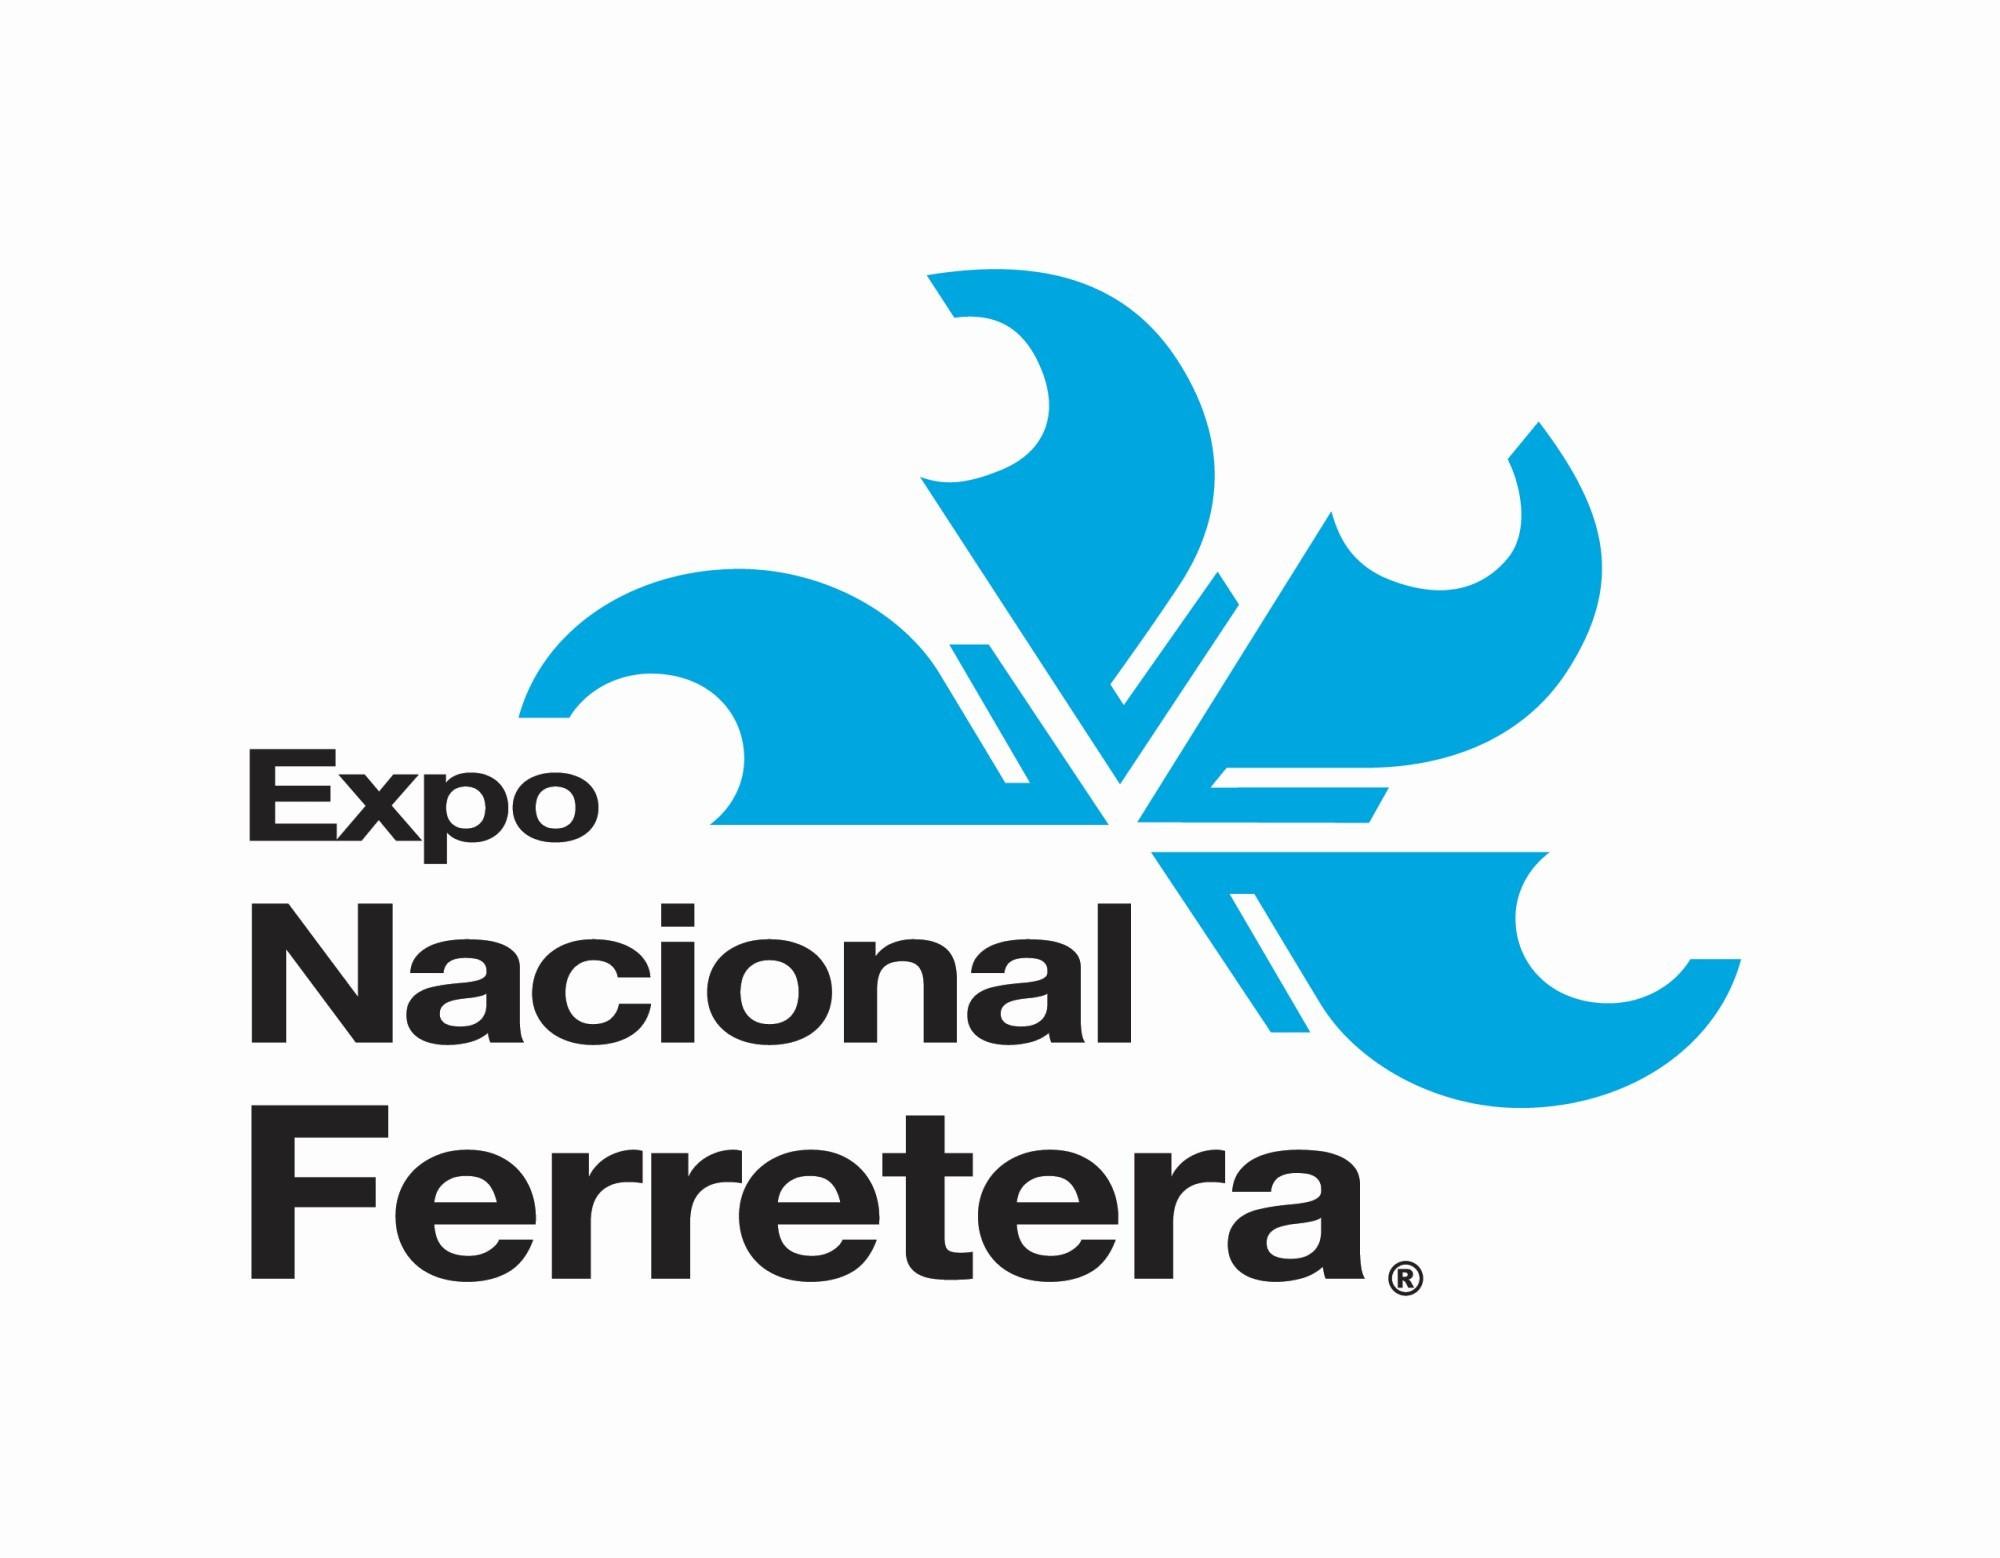 Expo Nacional Ferretera.jpg